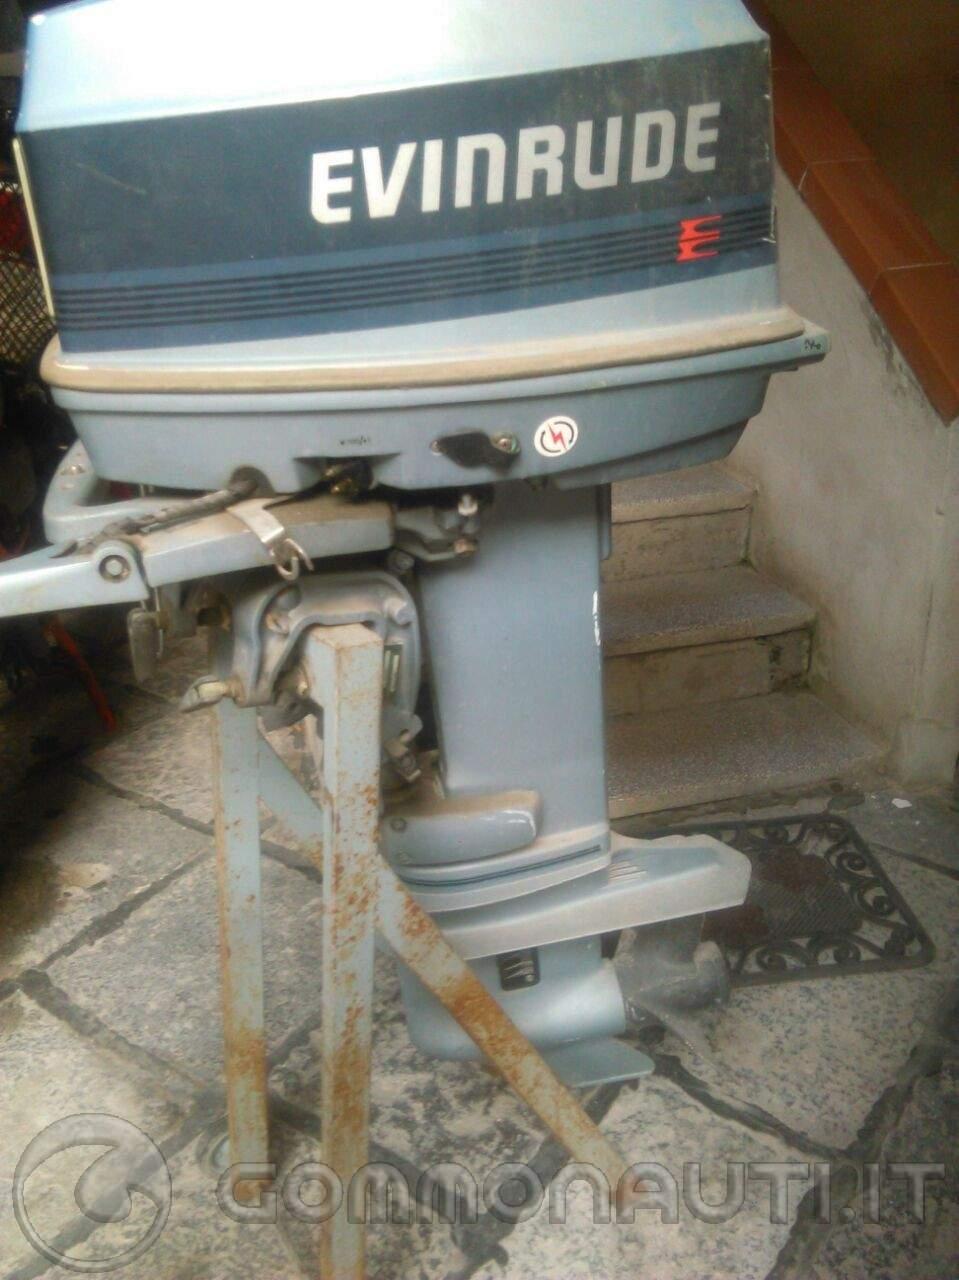 Schema Elettrico Evinrude 521 : Evinrude cv cc